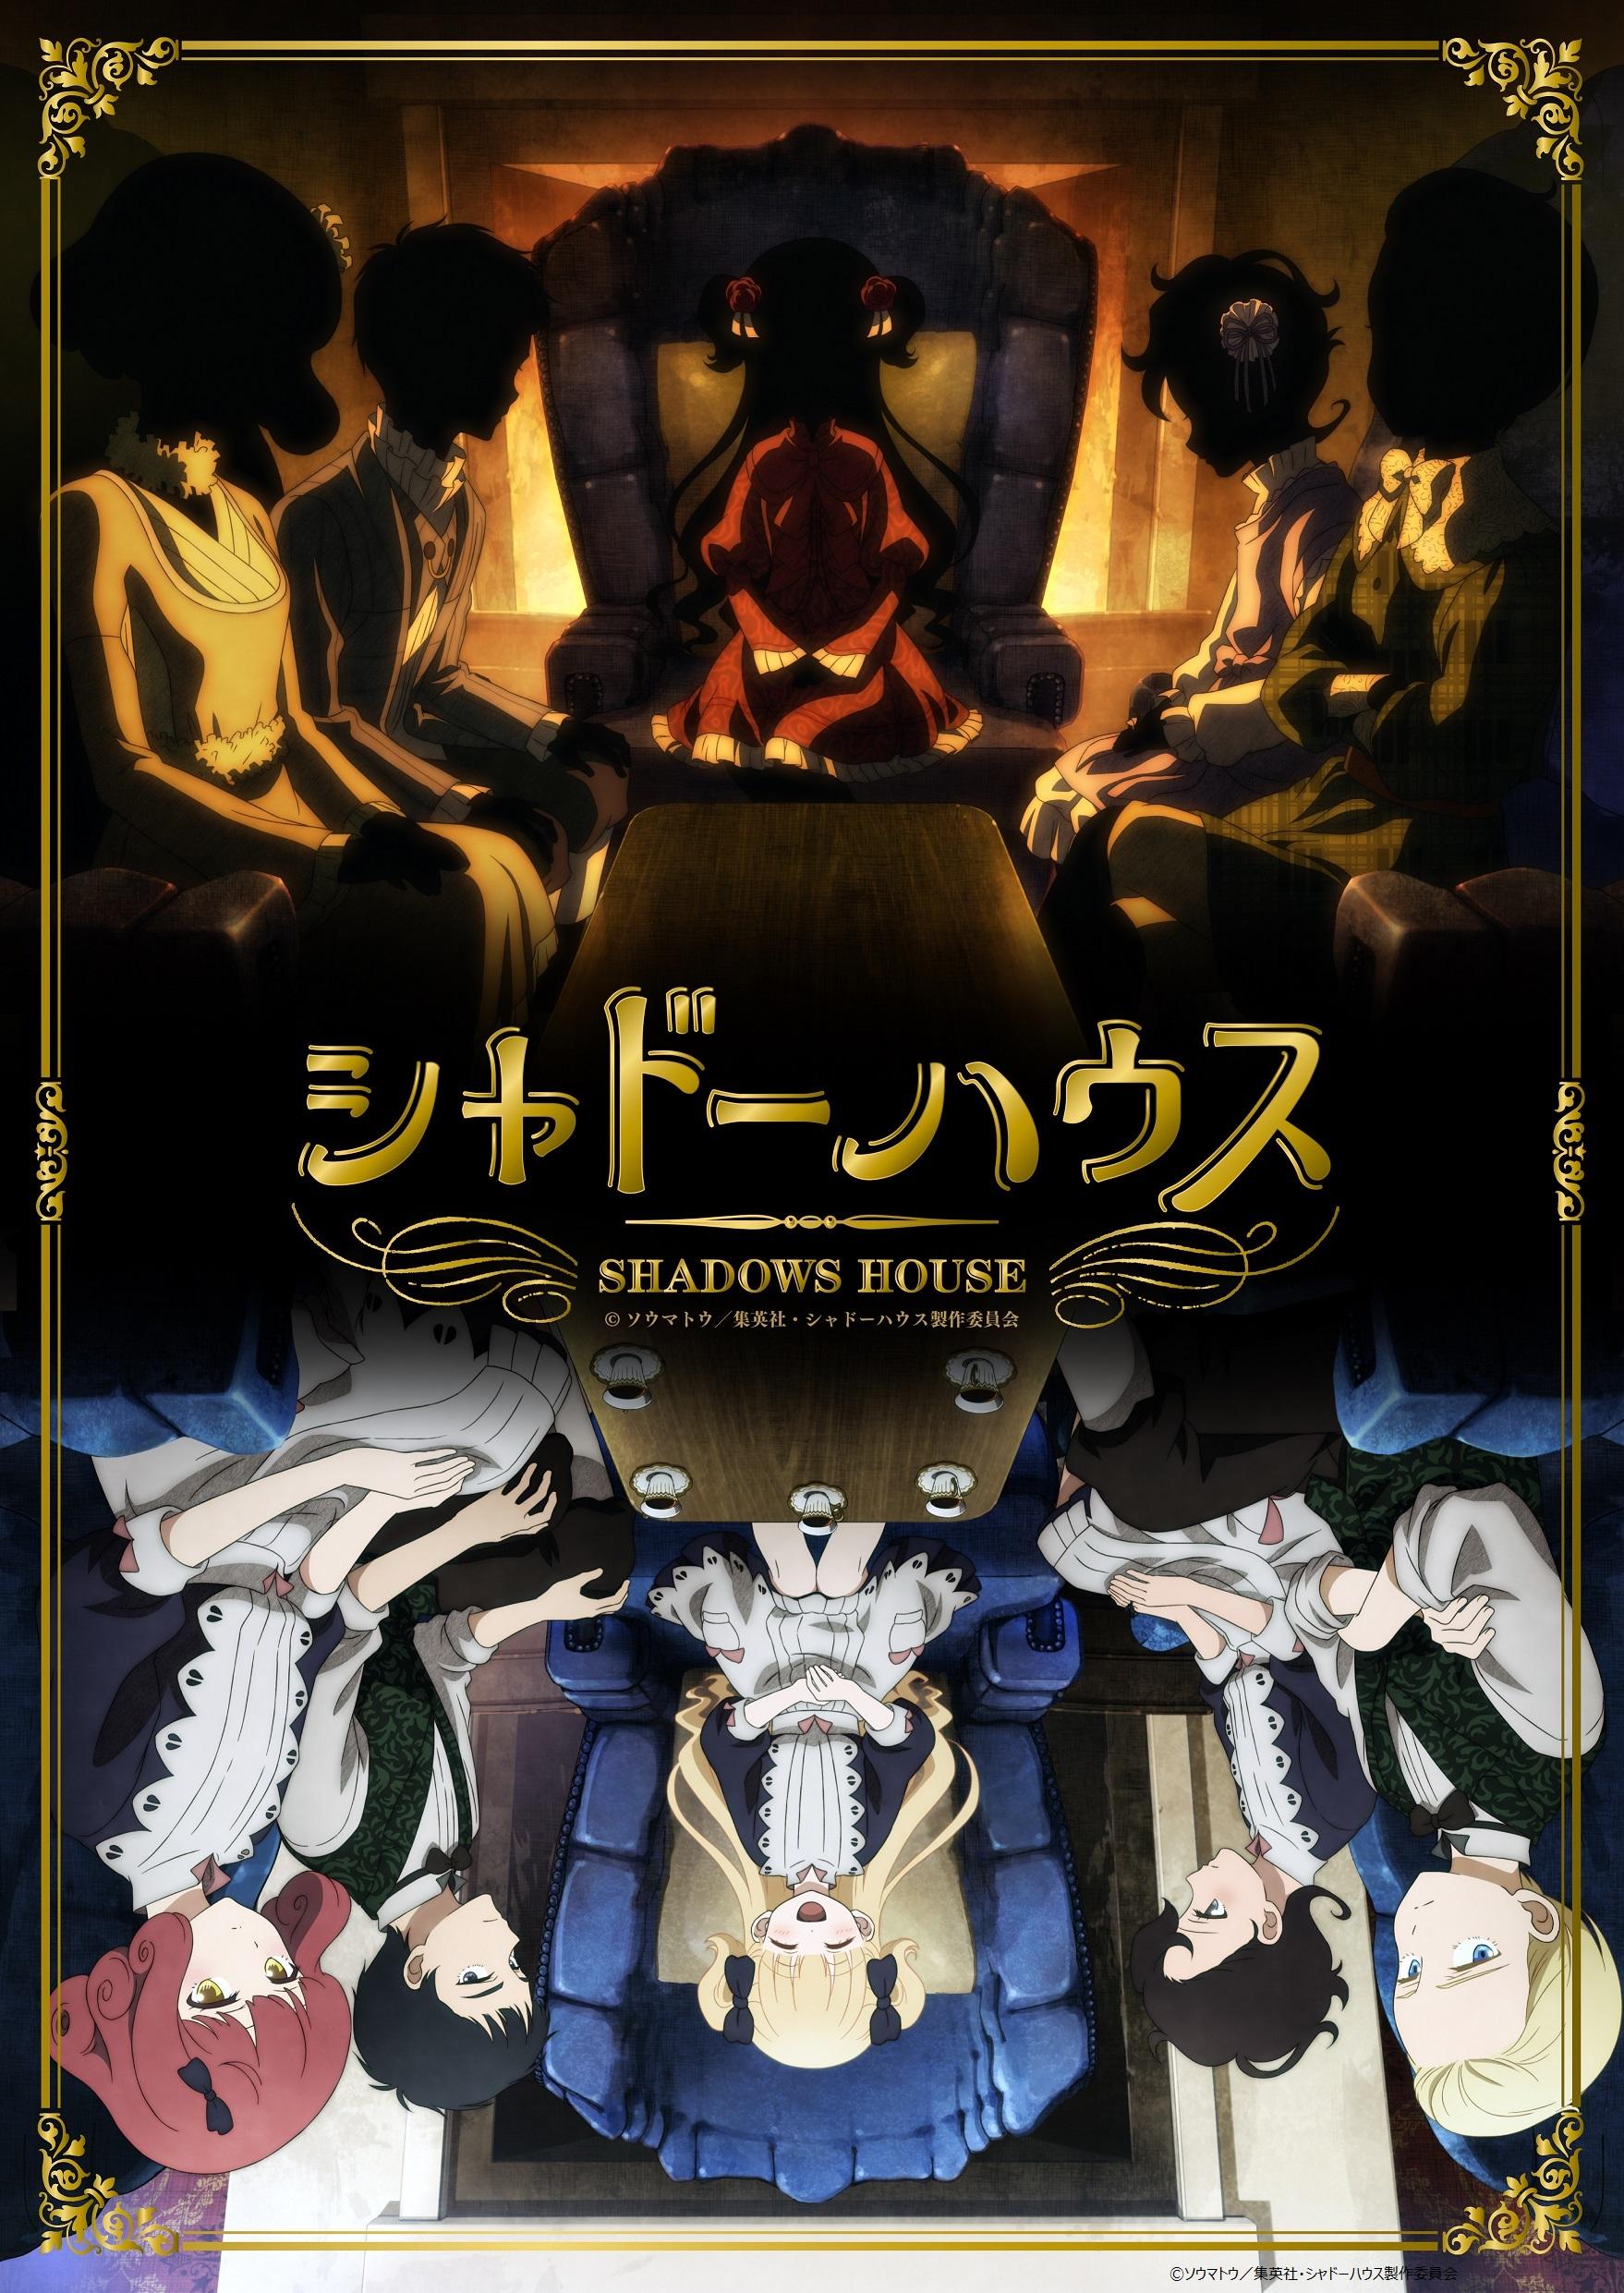 TVアニメ「シャドーハウス」第2期制作決定!新規カット含む特報PVが到着